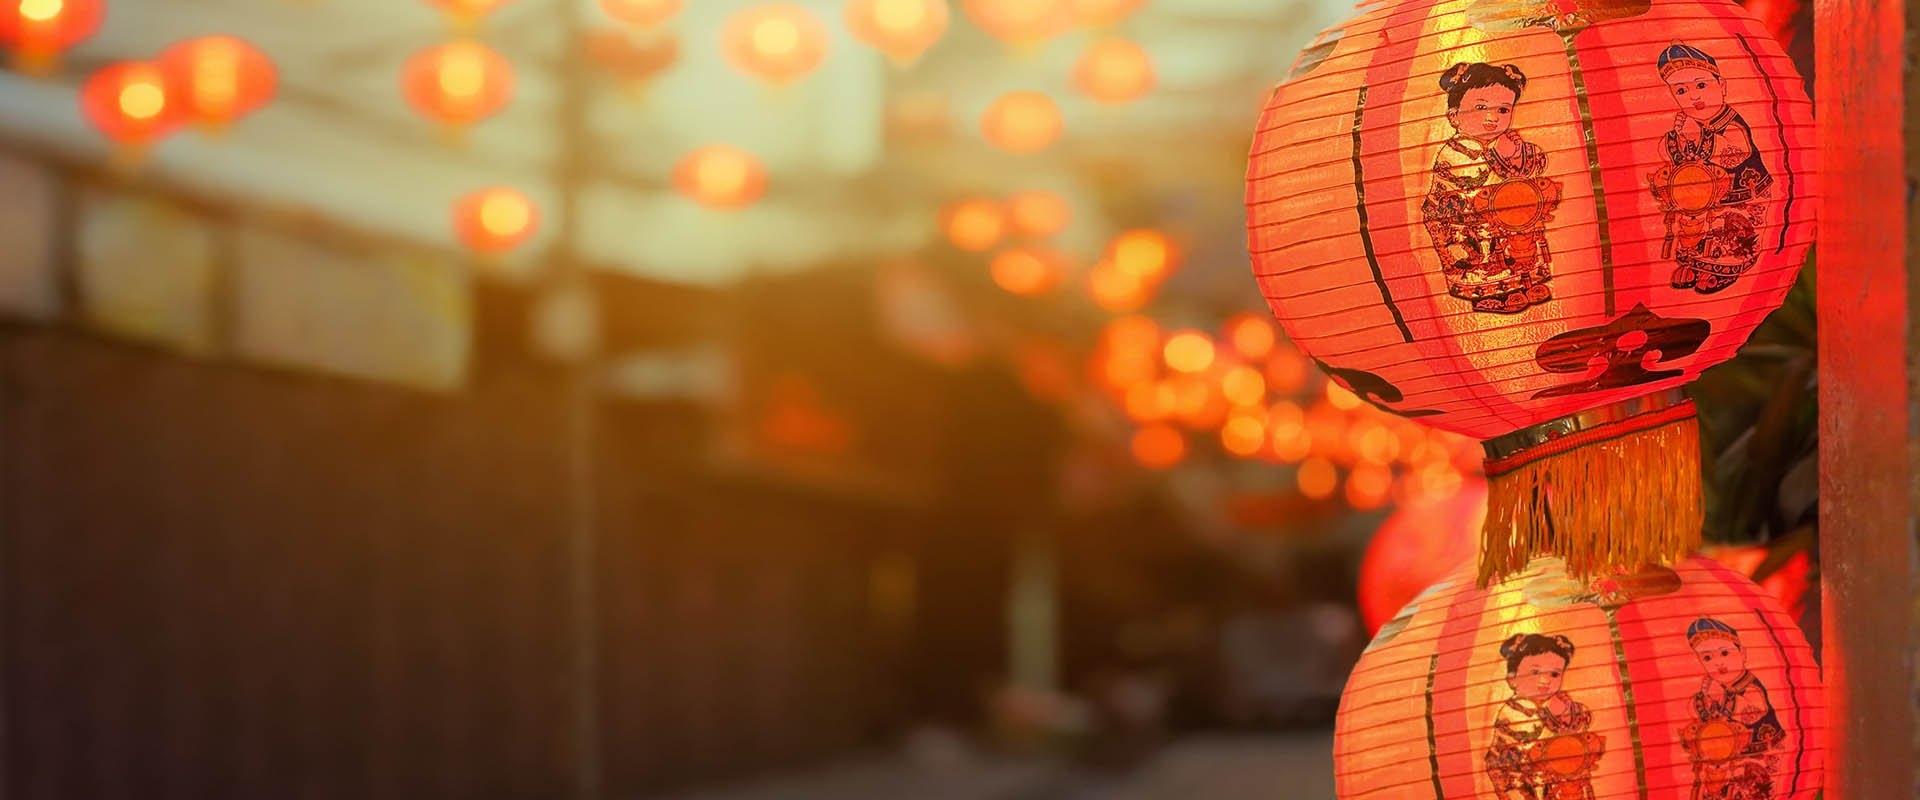 Tahun Baru Cina 2019 Dan 2020 – Publicholidays.my Calendar 2019 Raya Cina